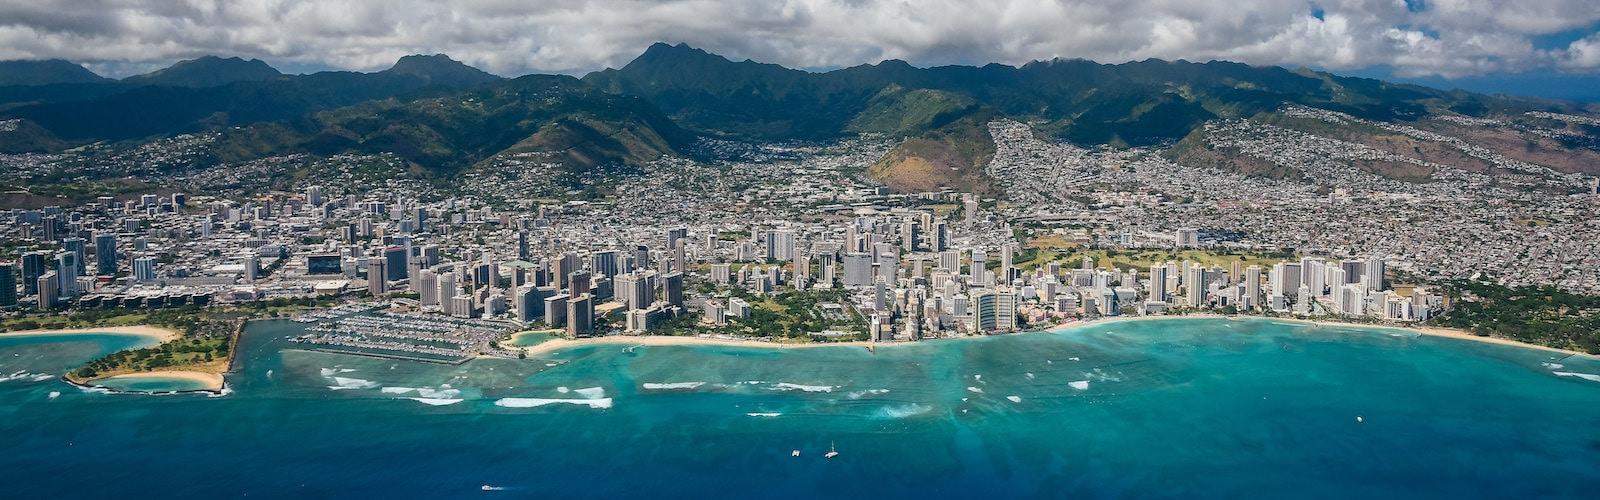 Waikiki Beach Stays, Hawaii Travel Site, Waikiki Vacation Rentals